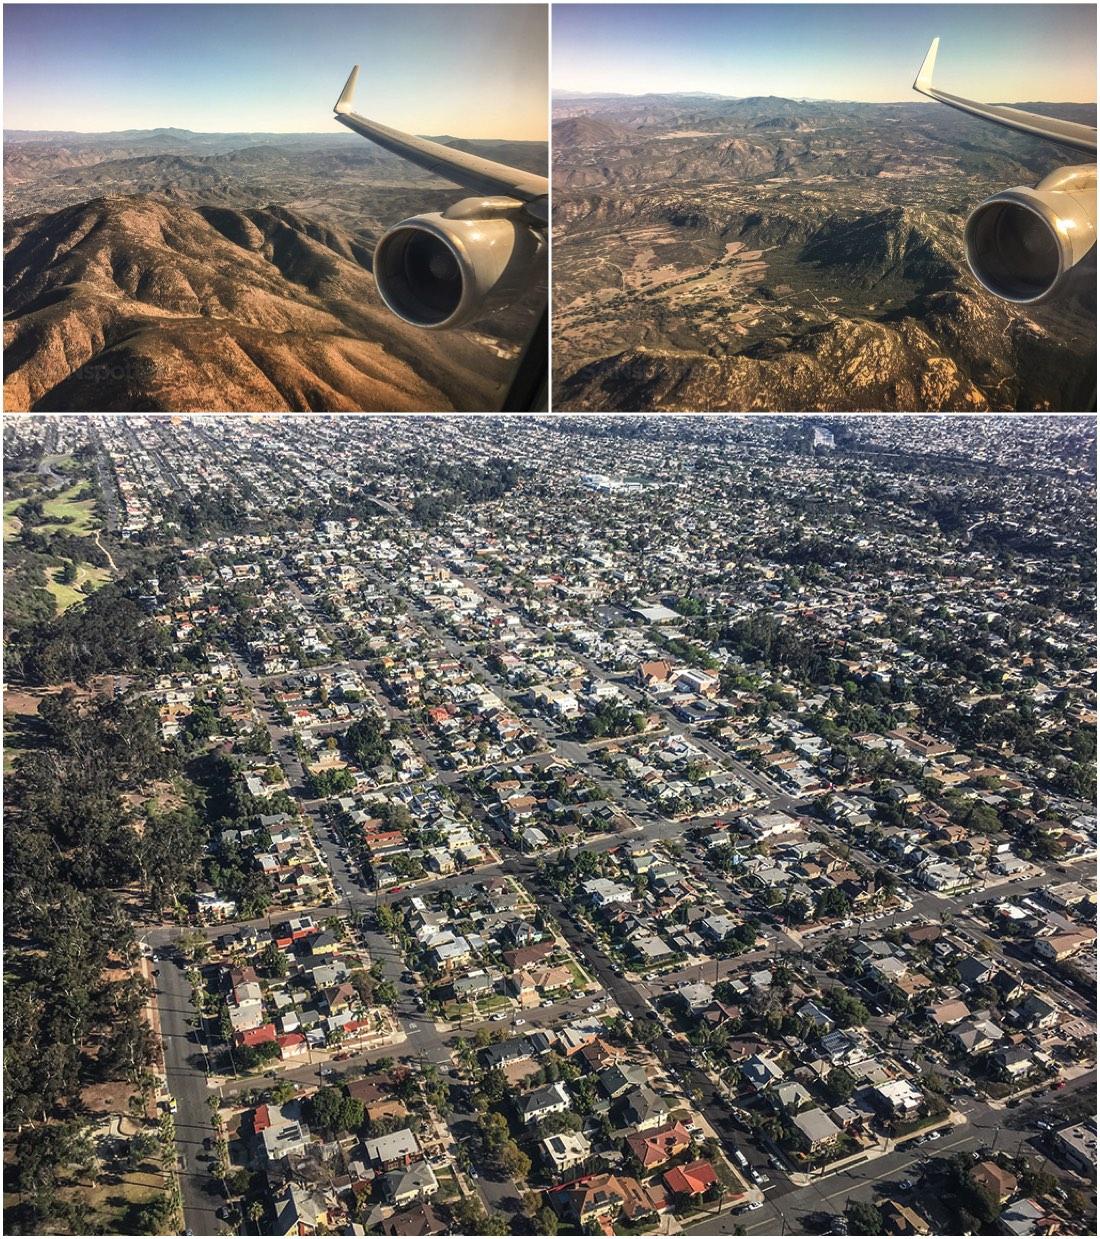 Flying into San Diego